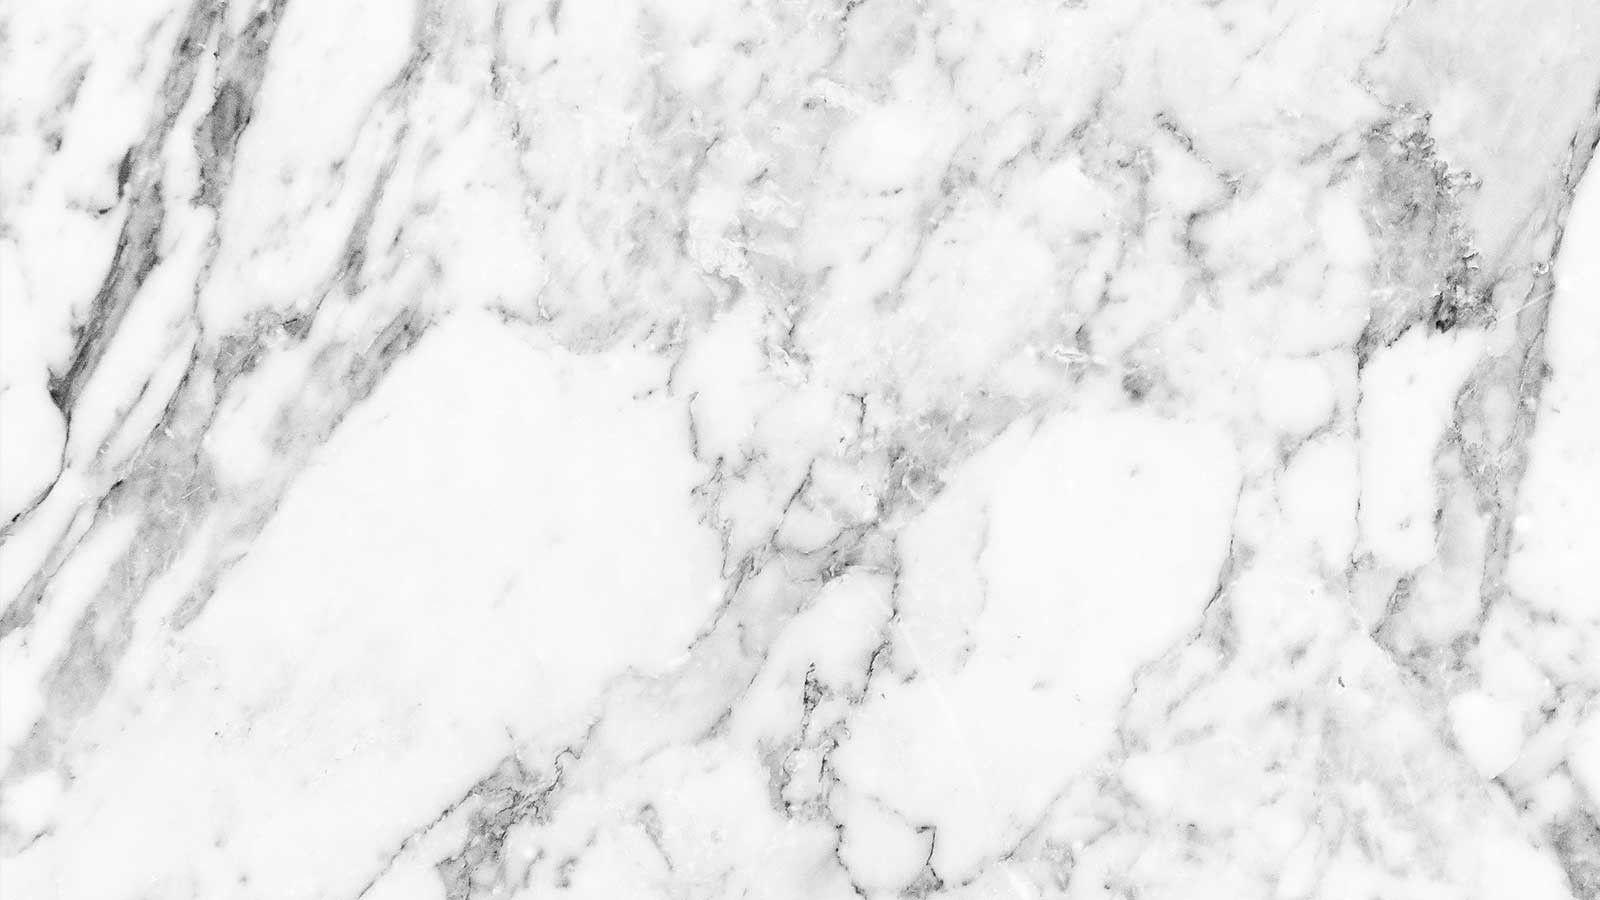 Great Wallpaper Marble Case - 6a7538a9118f40e147ec2b54a3dc775c  Snapshot_239642.jpg